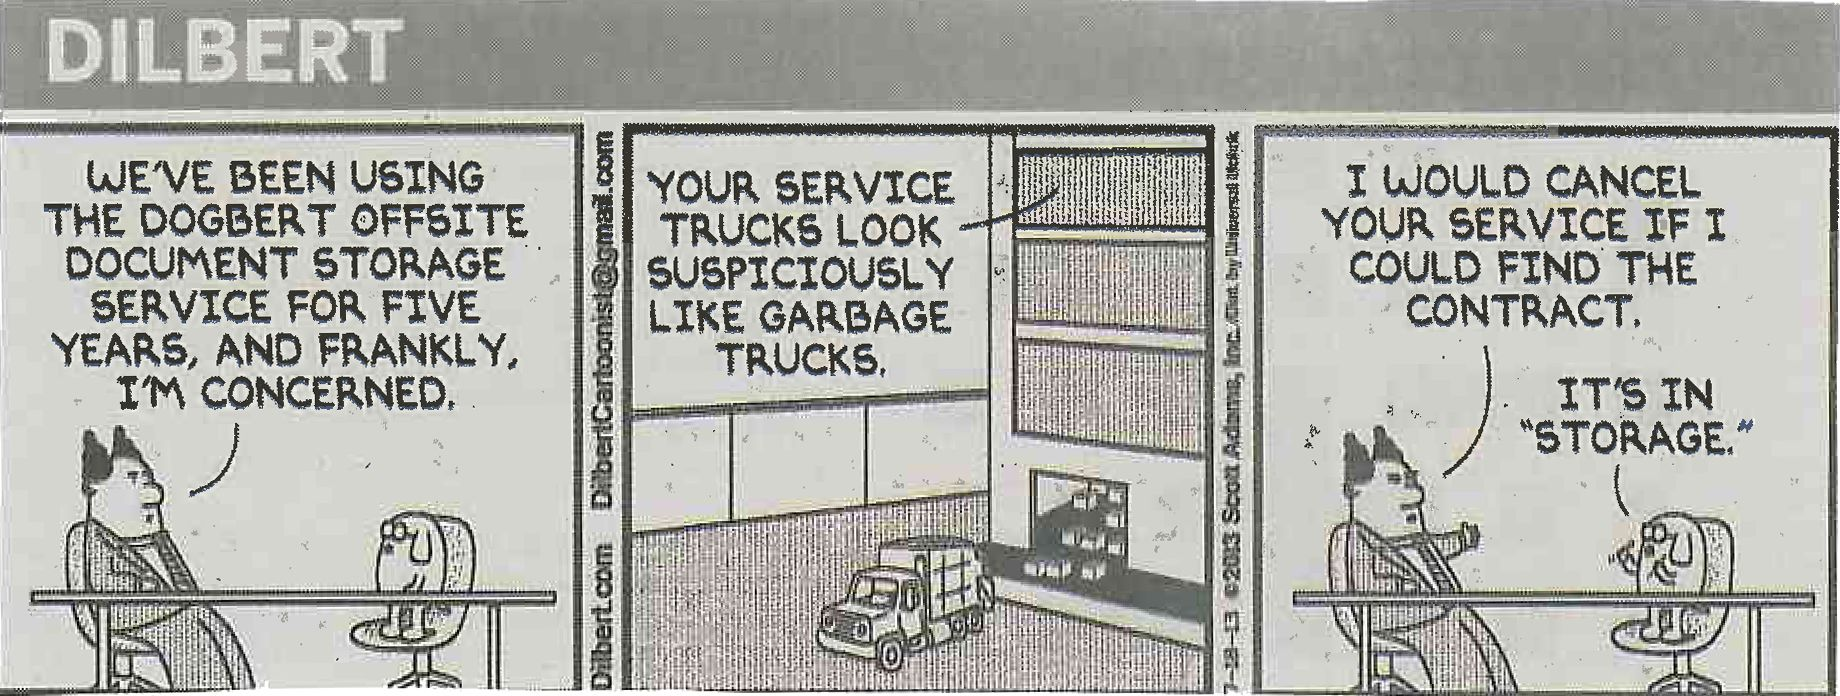 Comic Dilbert On Self Storage Self Storage Budget Storage Document Storage